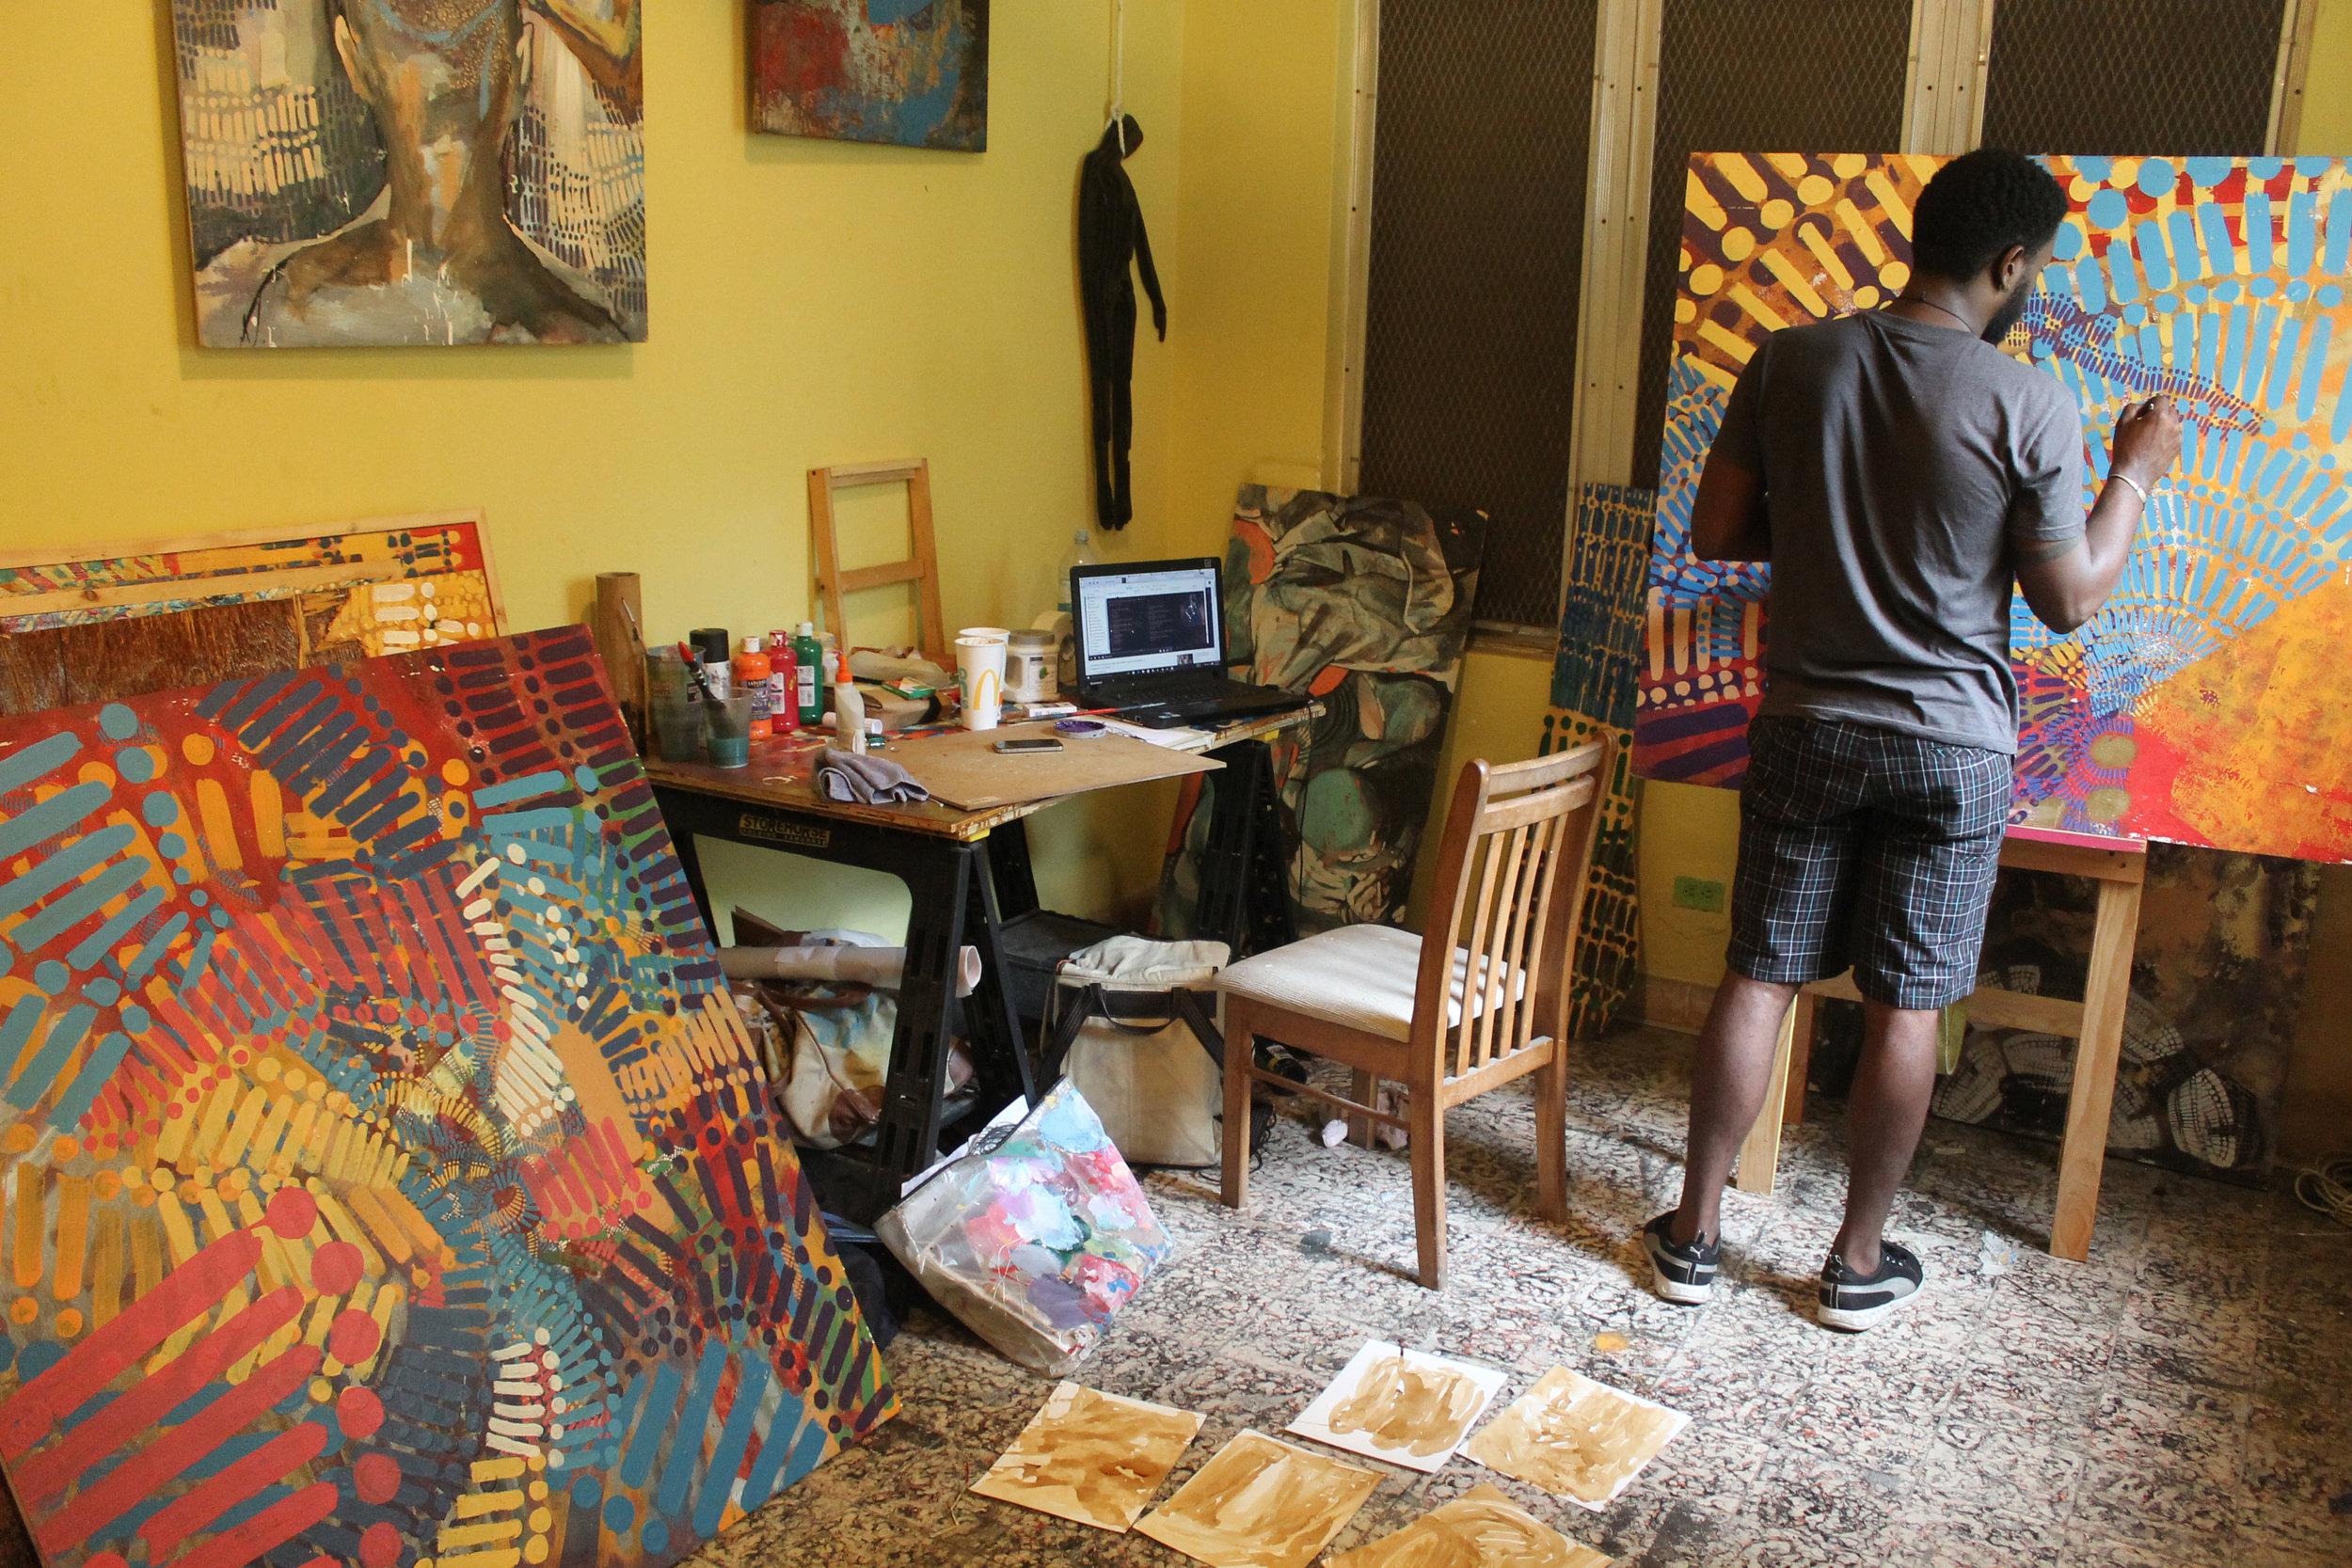 Artist Navarro Newton in his studio working as one of three recipients of the 2016 Popop Junior Residency Prize. Image courtesy of Popopstudios ICVA.